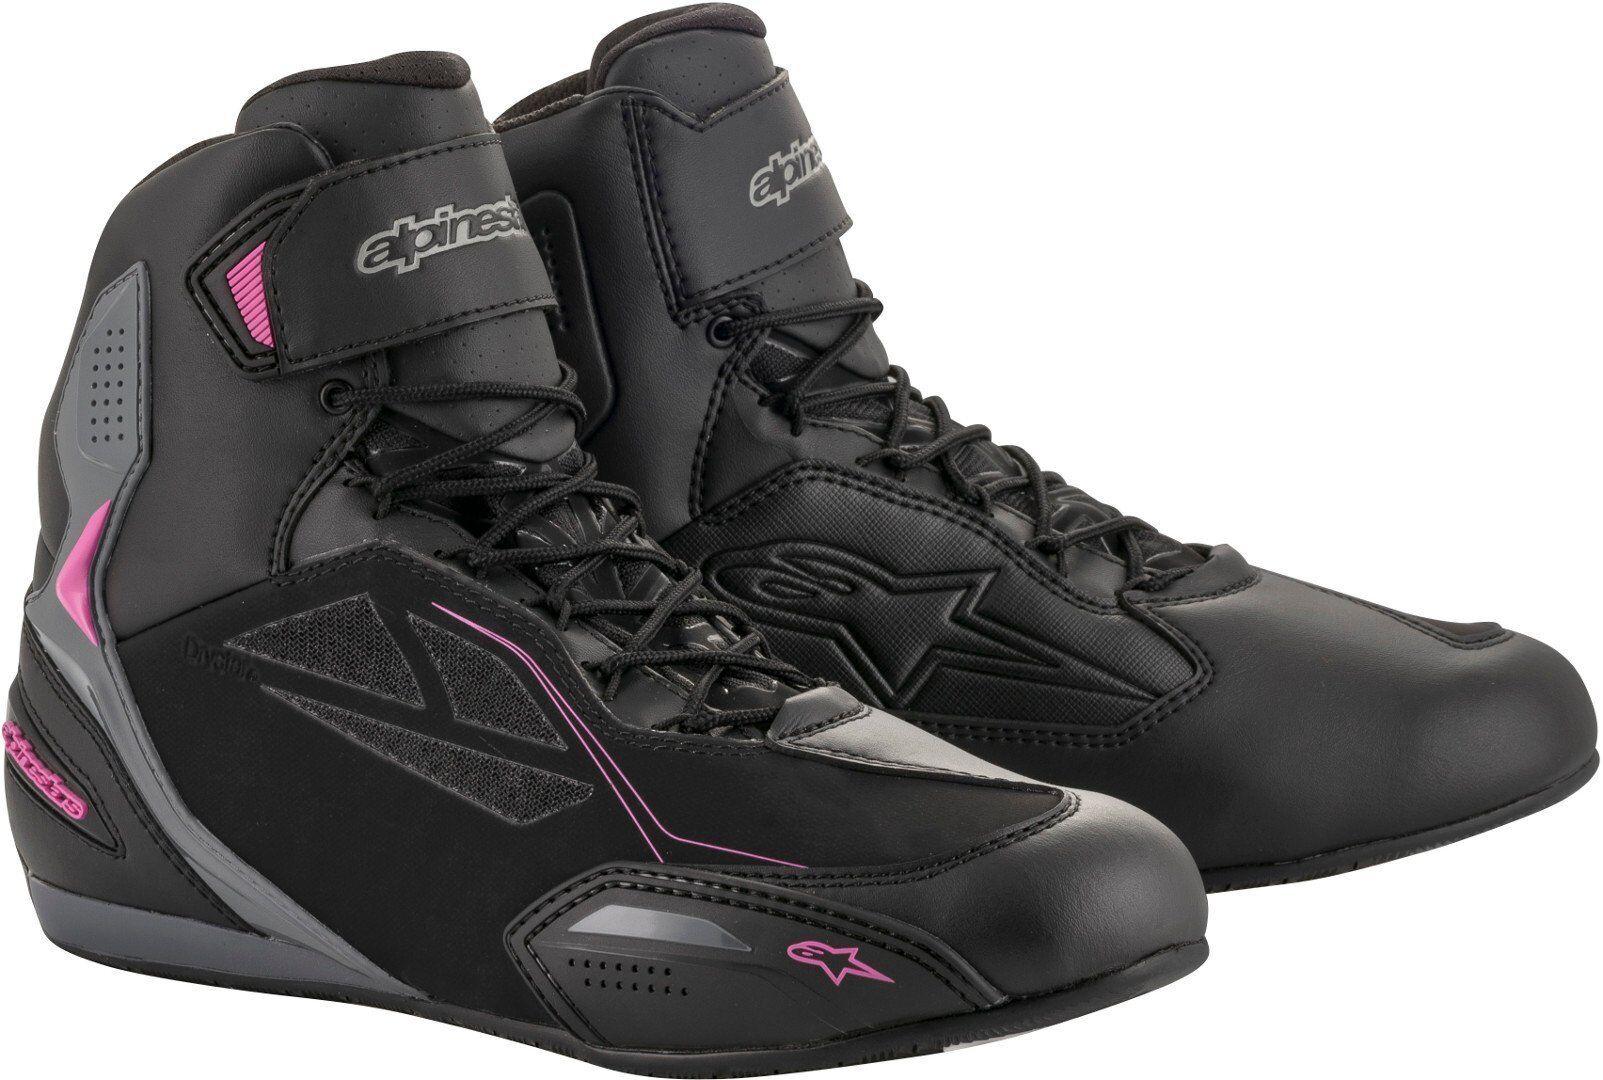 Alpinestars Stella Faster-3 Drystar Chaussures de moto de dames Noir Gris Rose taille : 40